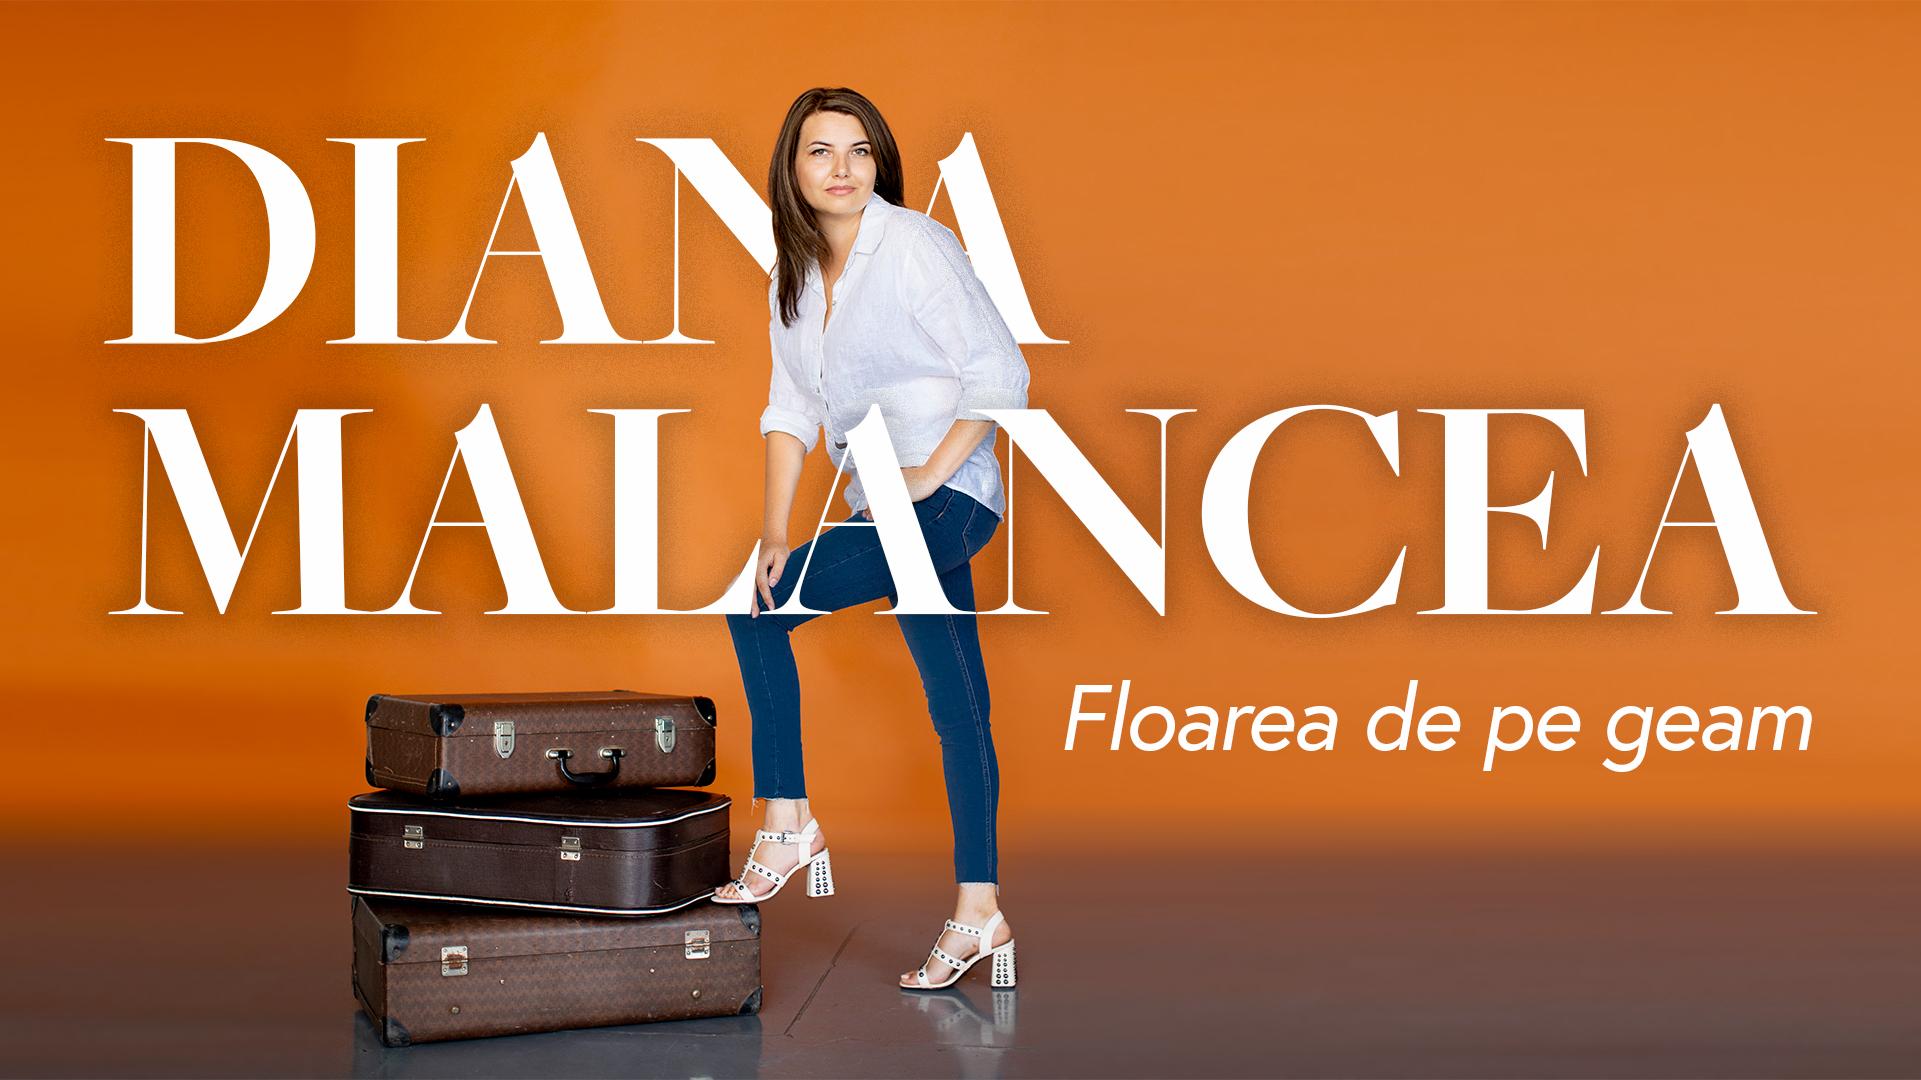 Diana Malancea Artwork (1)